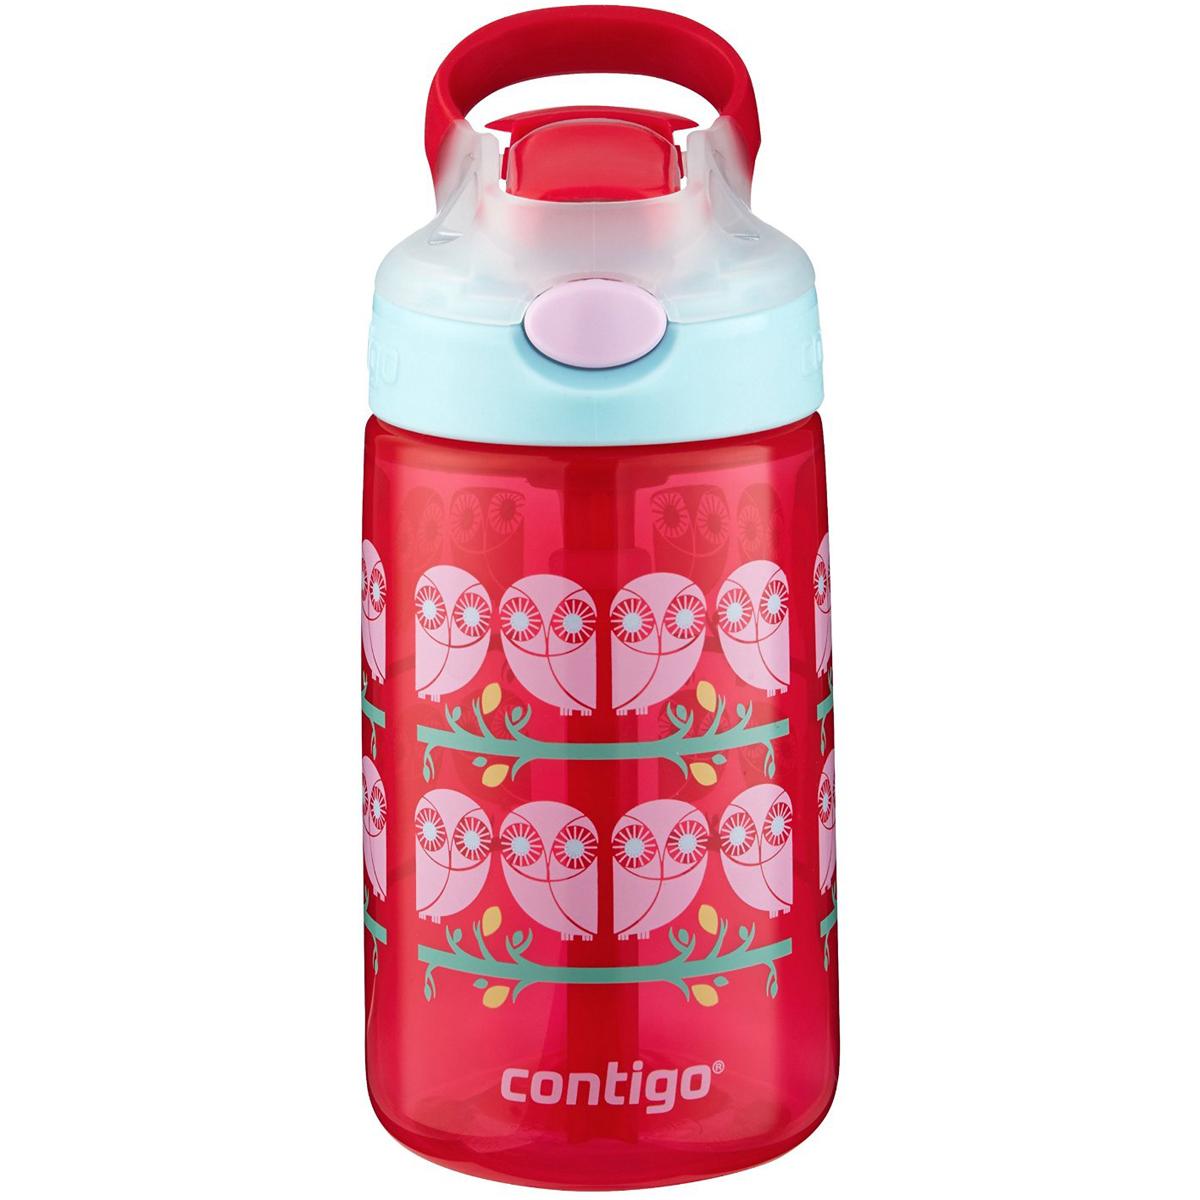 Contigo-14-oz-Kid-039-s-Autospout-Gizmo-Flip-Water-Bottle